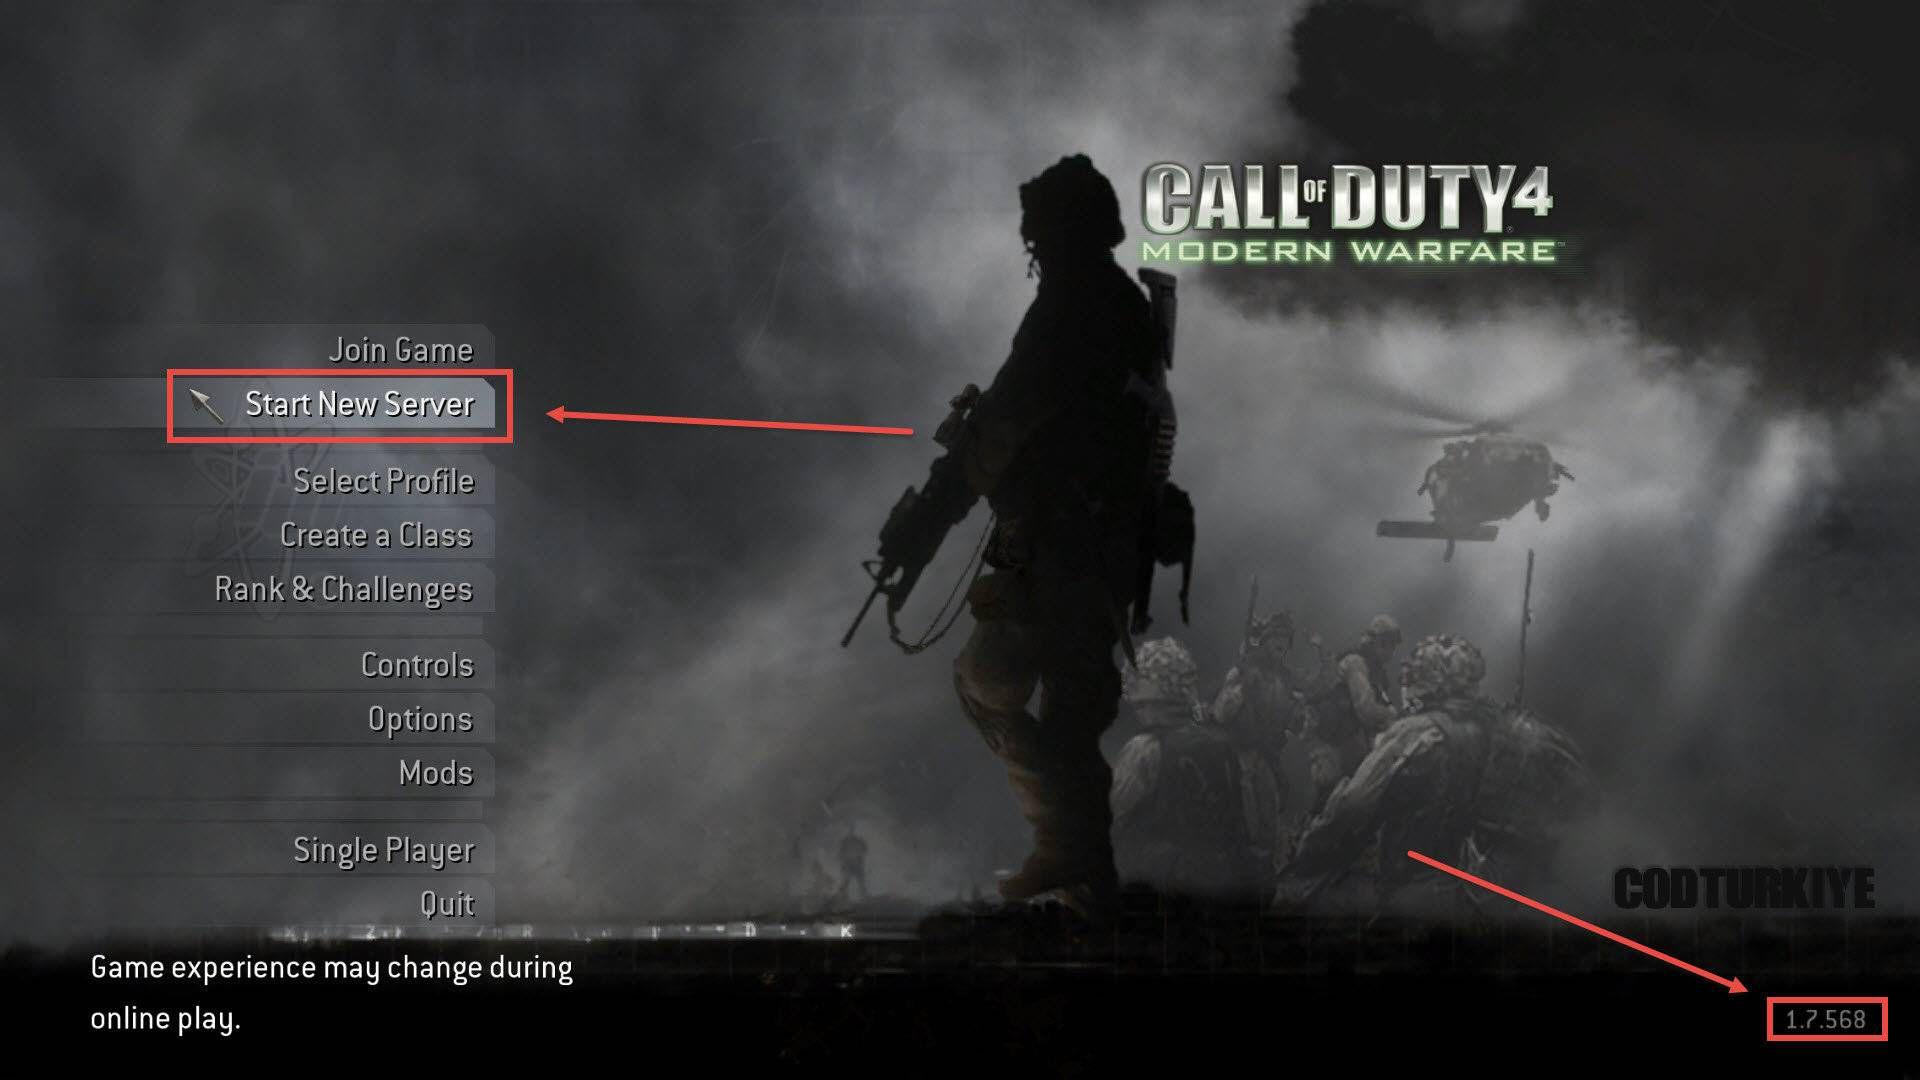 Call of Duty 4 Modern Warfare Start New Server